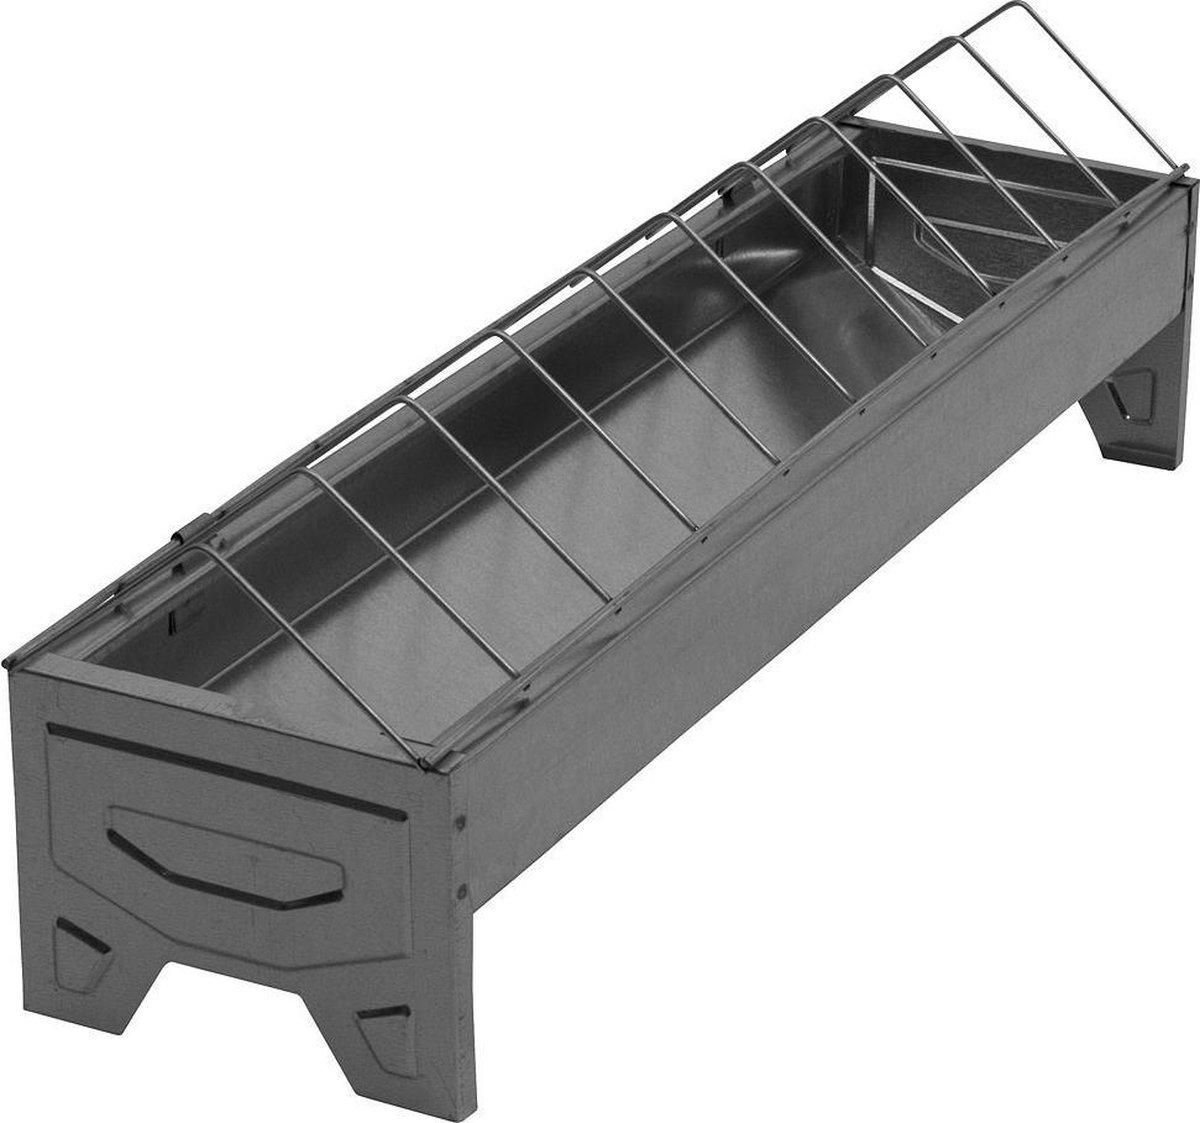 Pluimveevoerbak 50cm verzinkt draadgril - Animalcare Holland